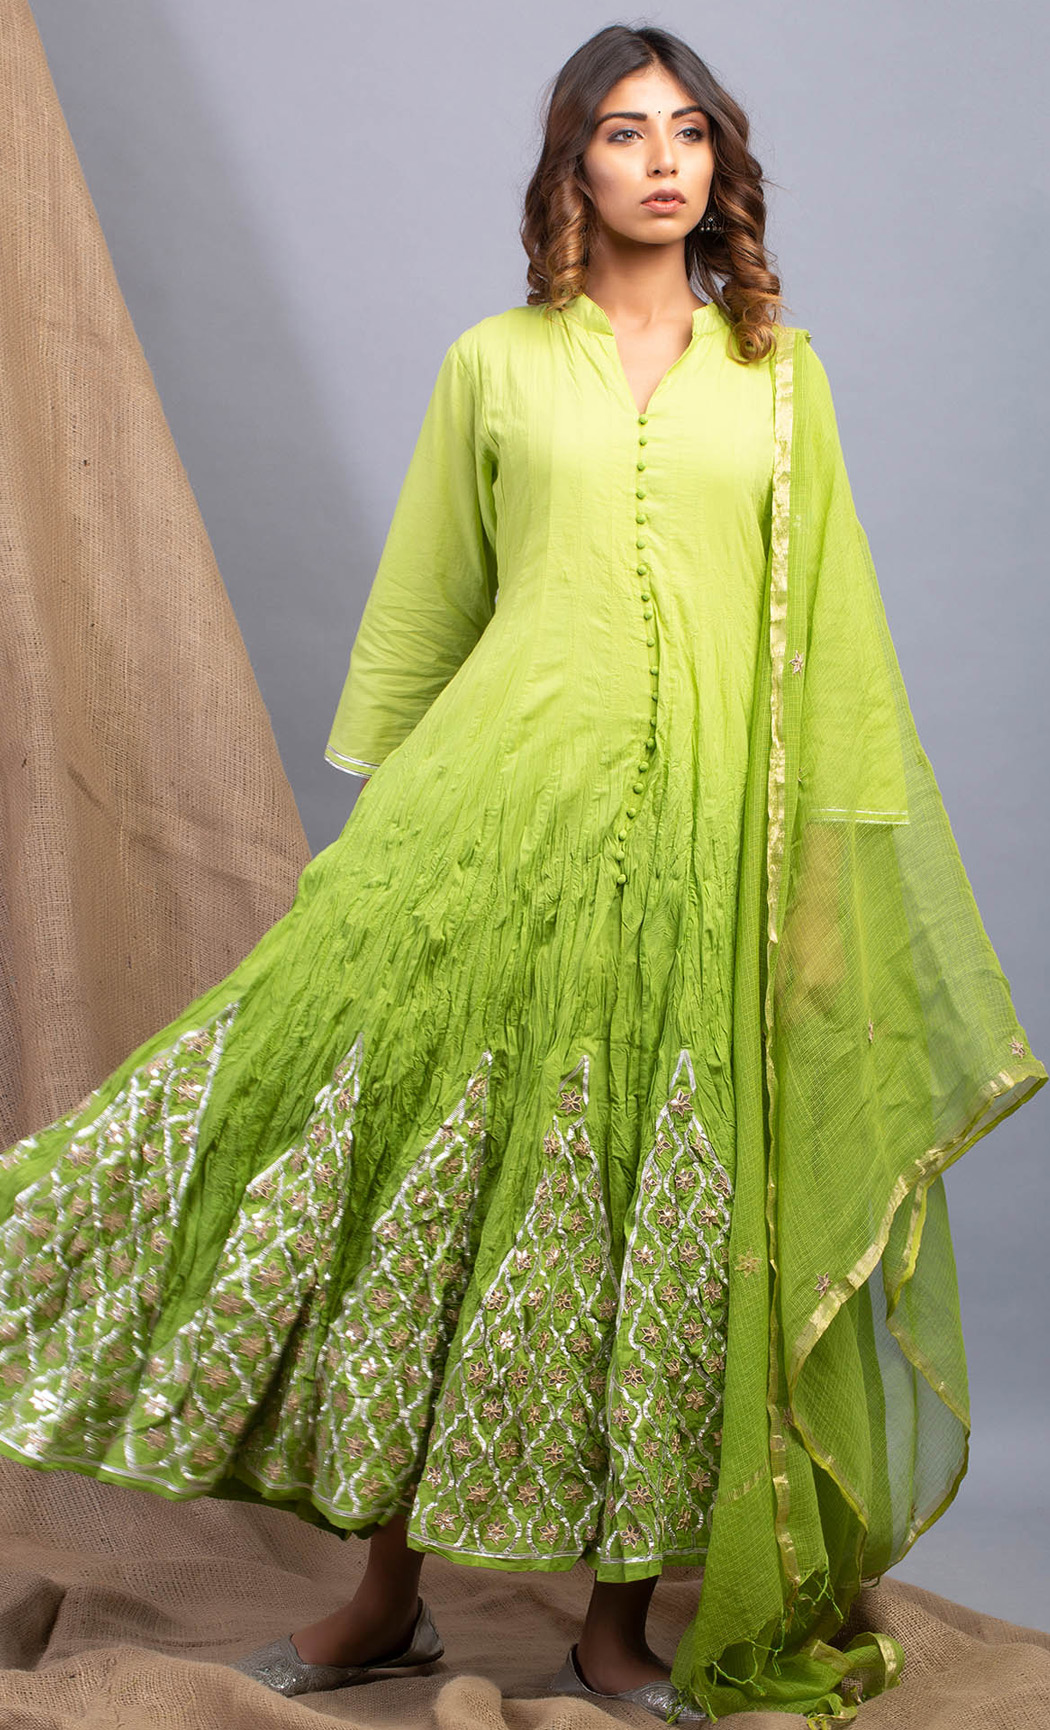 Evergreen Hue Green Kurta and Dupatta Set. Buy Online.